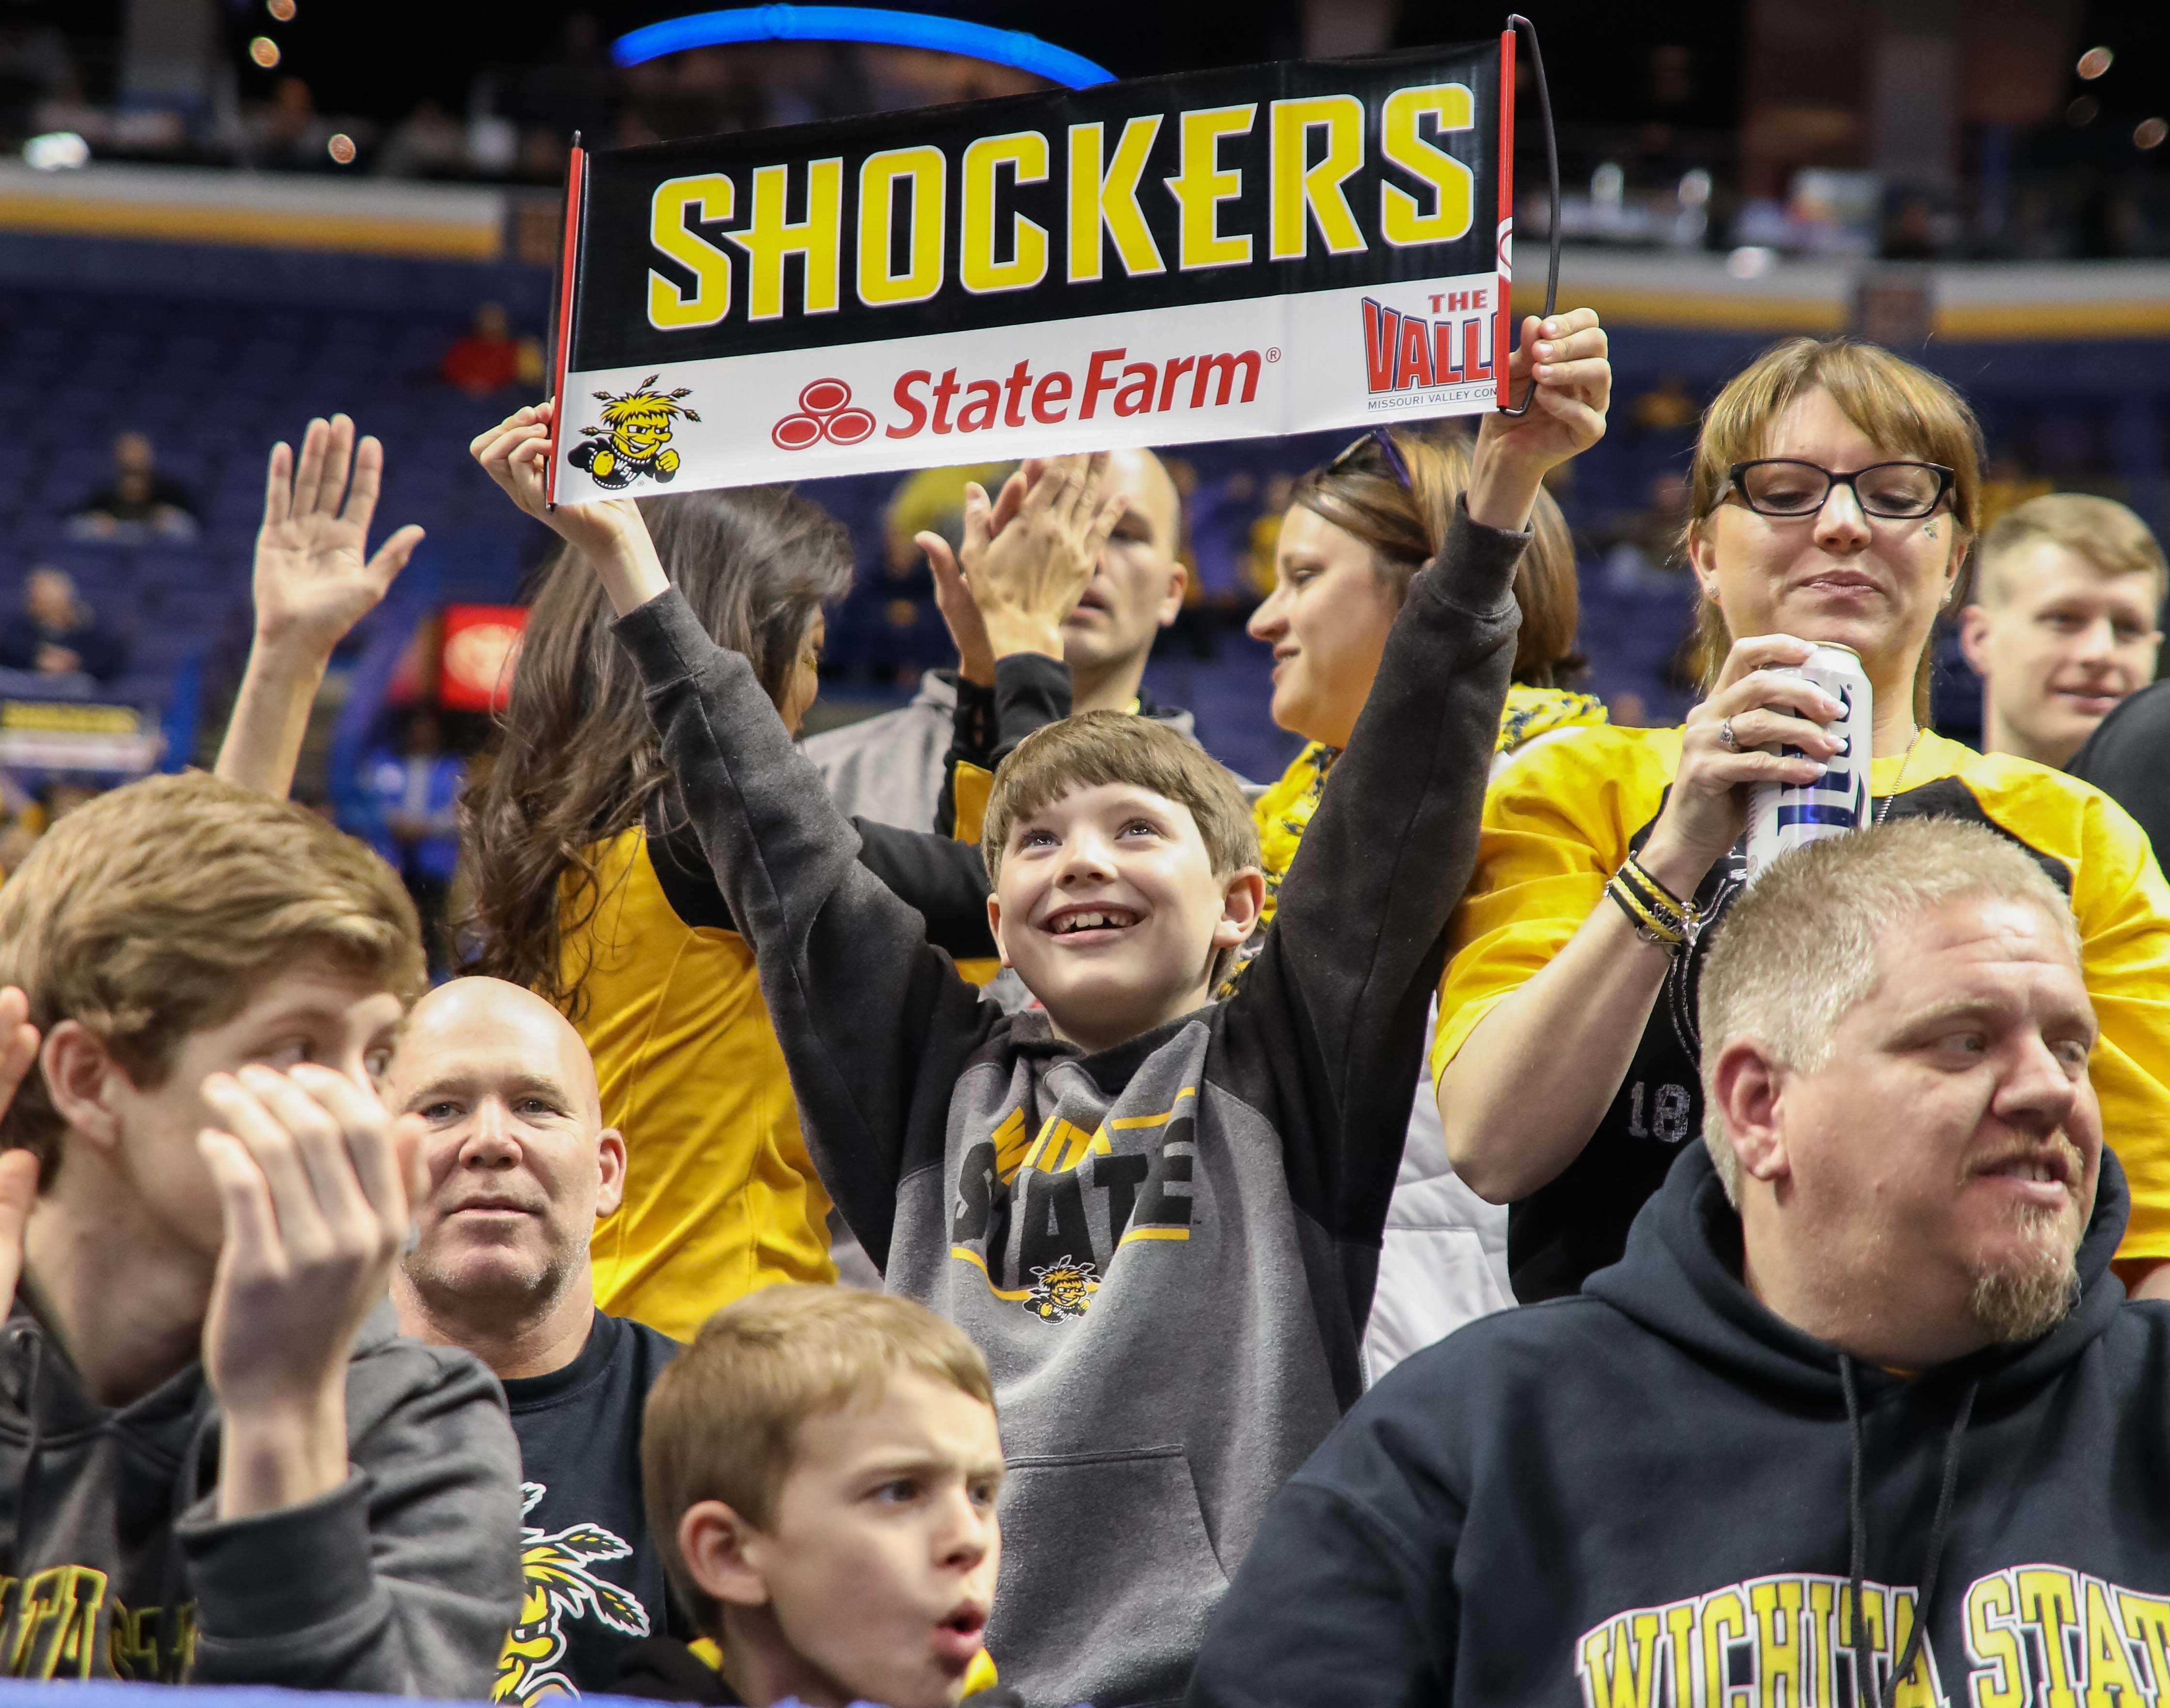 A young Wichita State fan celebrates WSU's 82-56 win over Bradley.